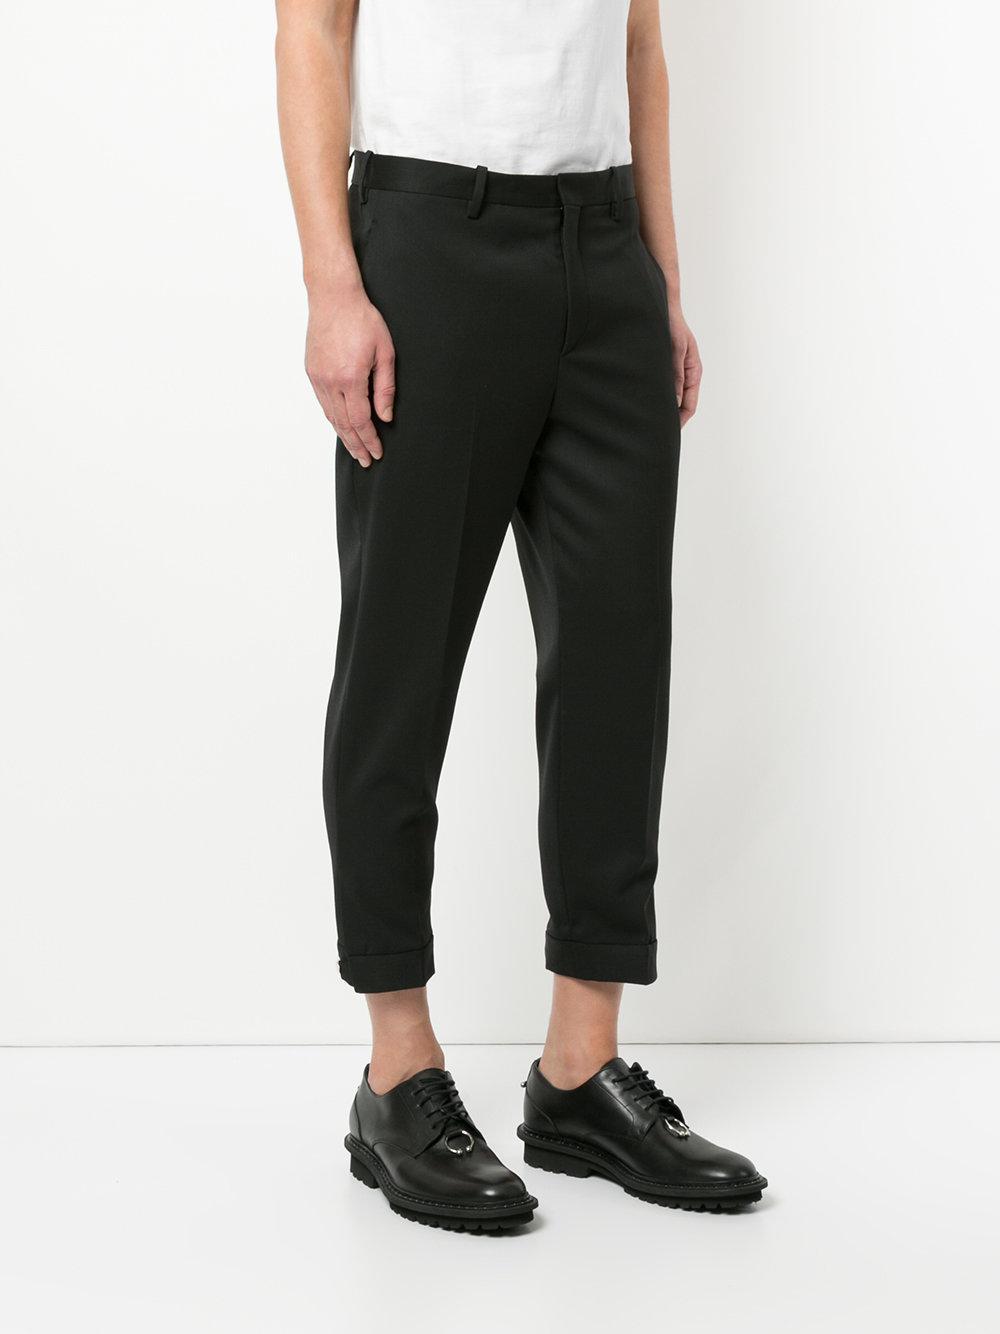 Neil Barrett Wool Suiting Trousers in Black for Men